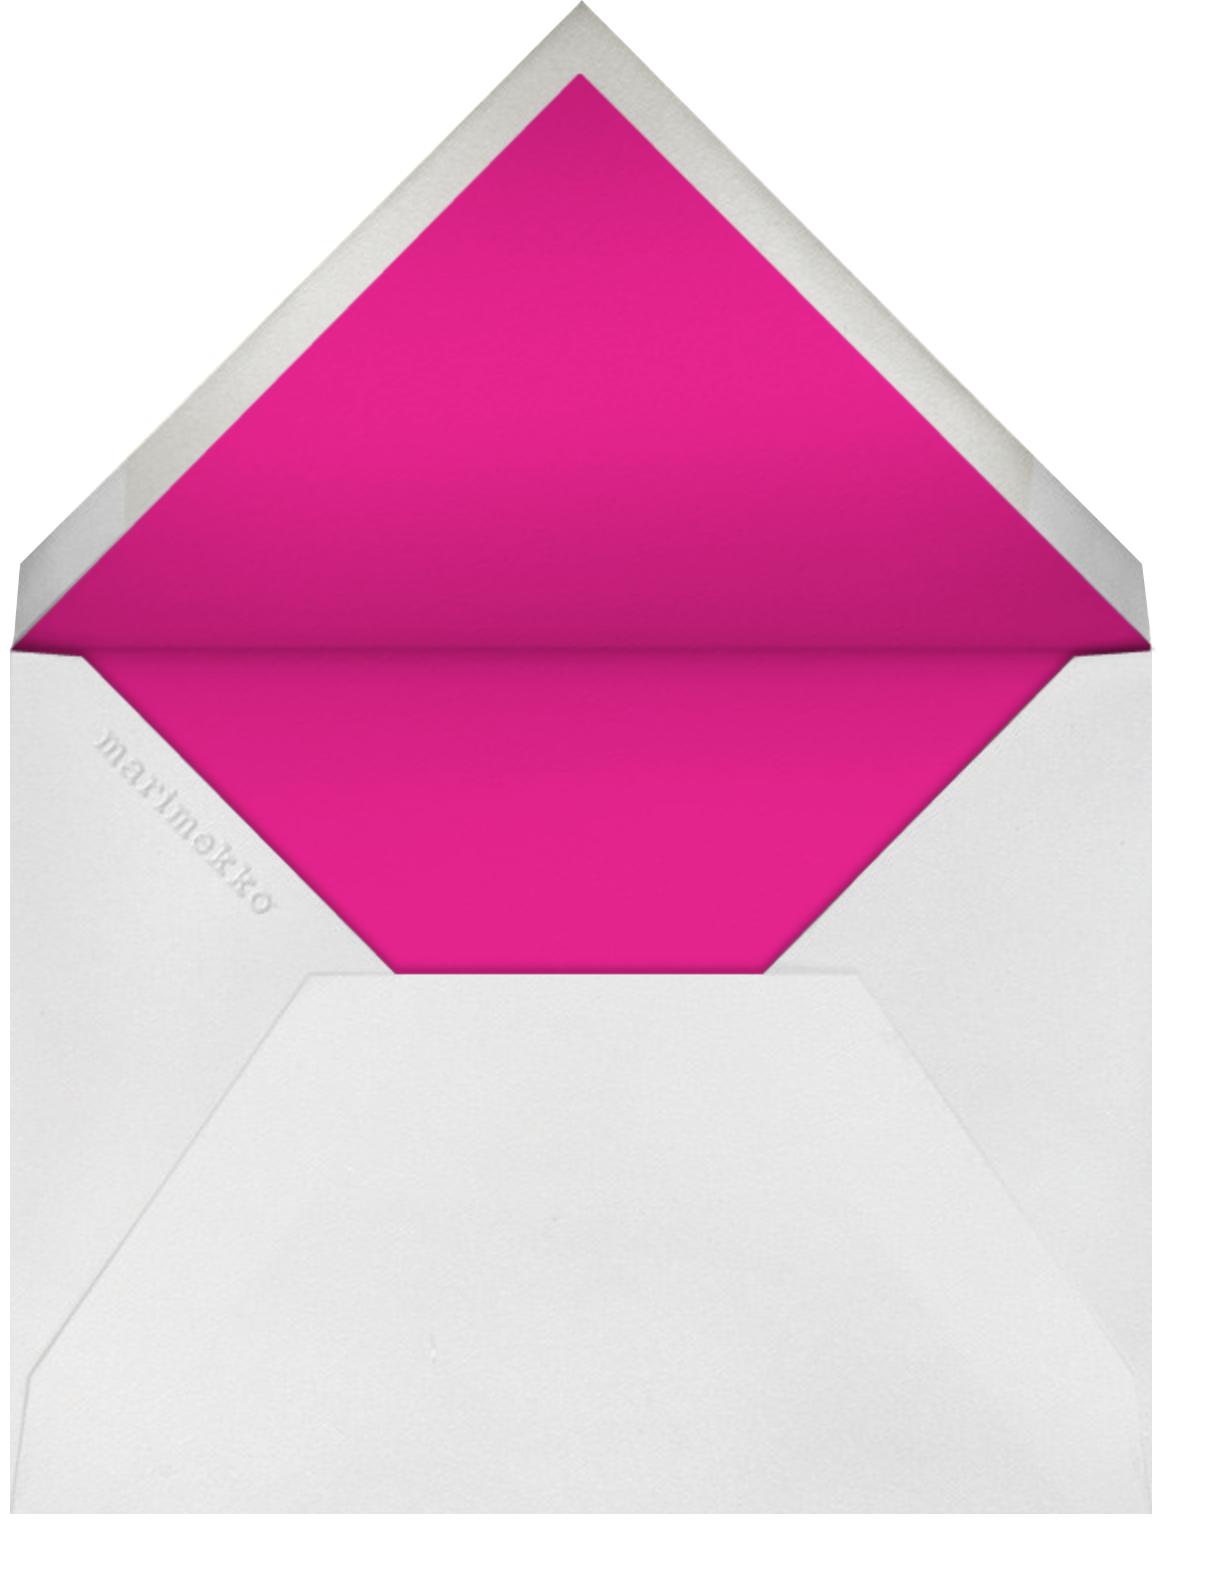 Sateenkaari - Pink - Marimekko - Summer entertaining - envelope back